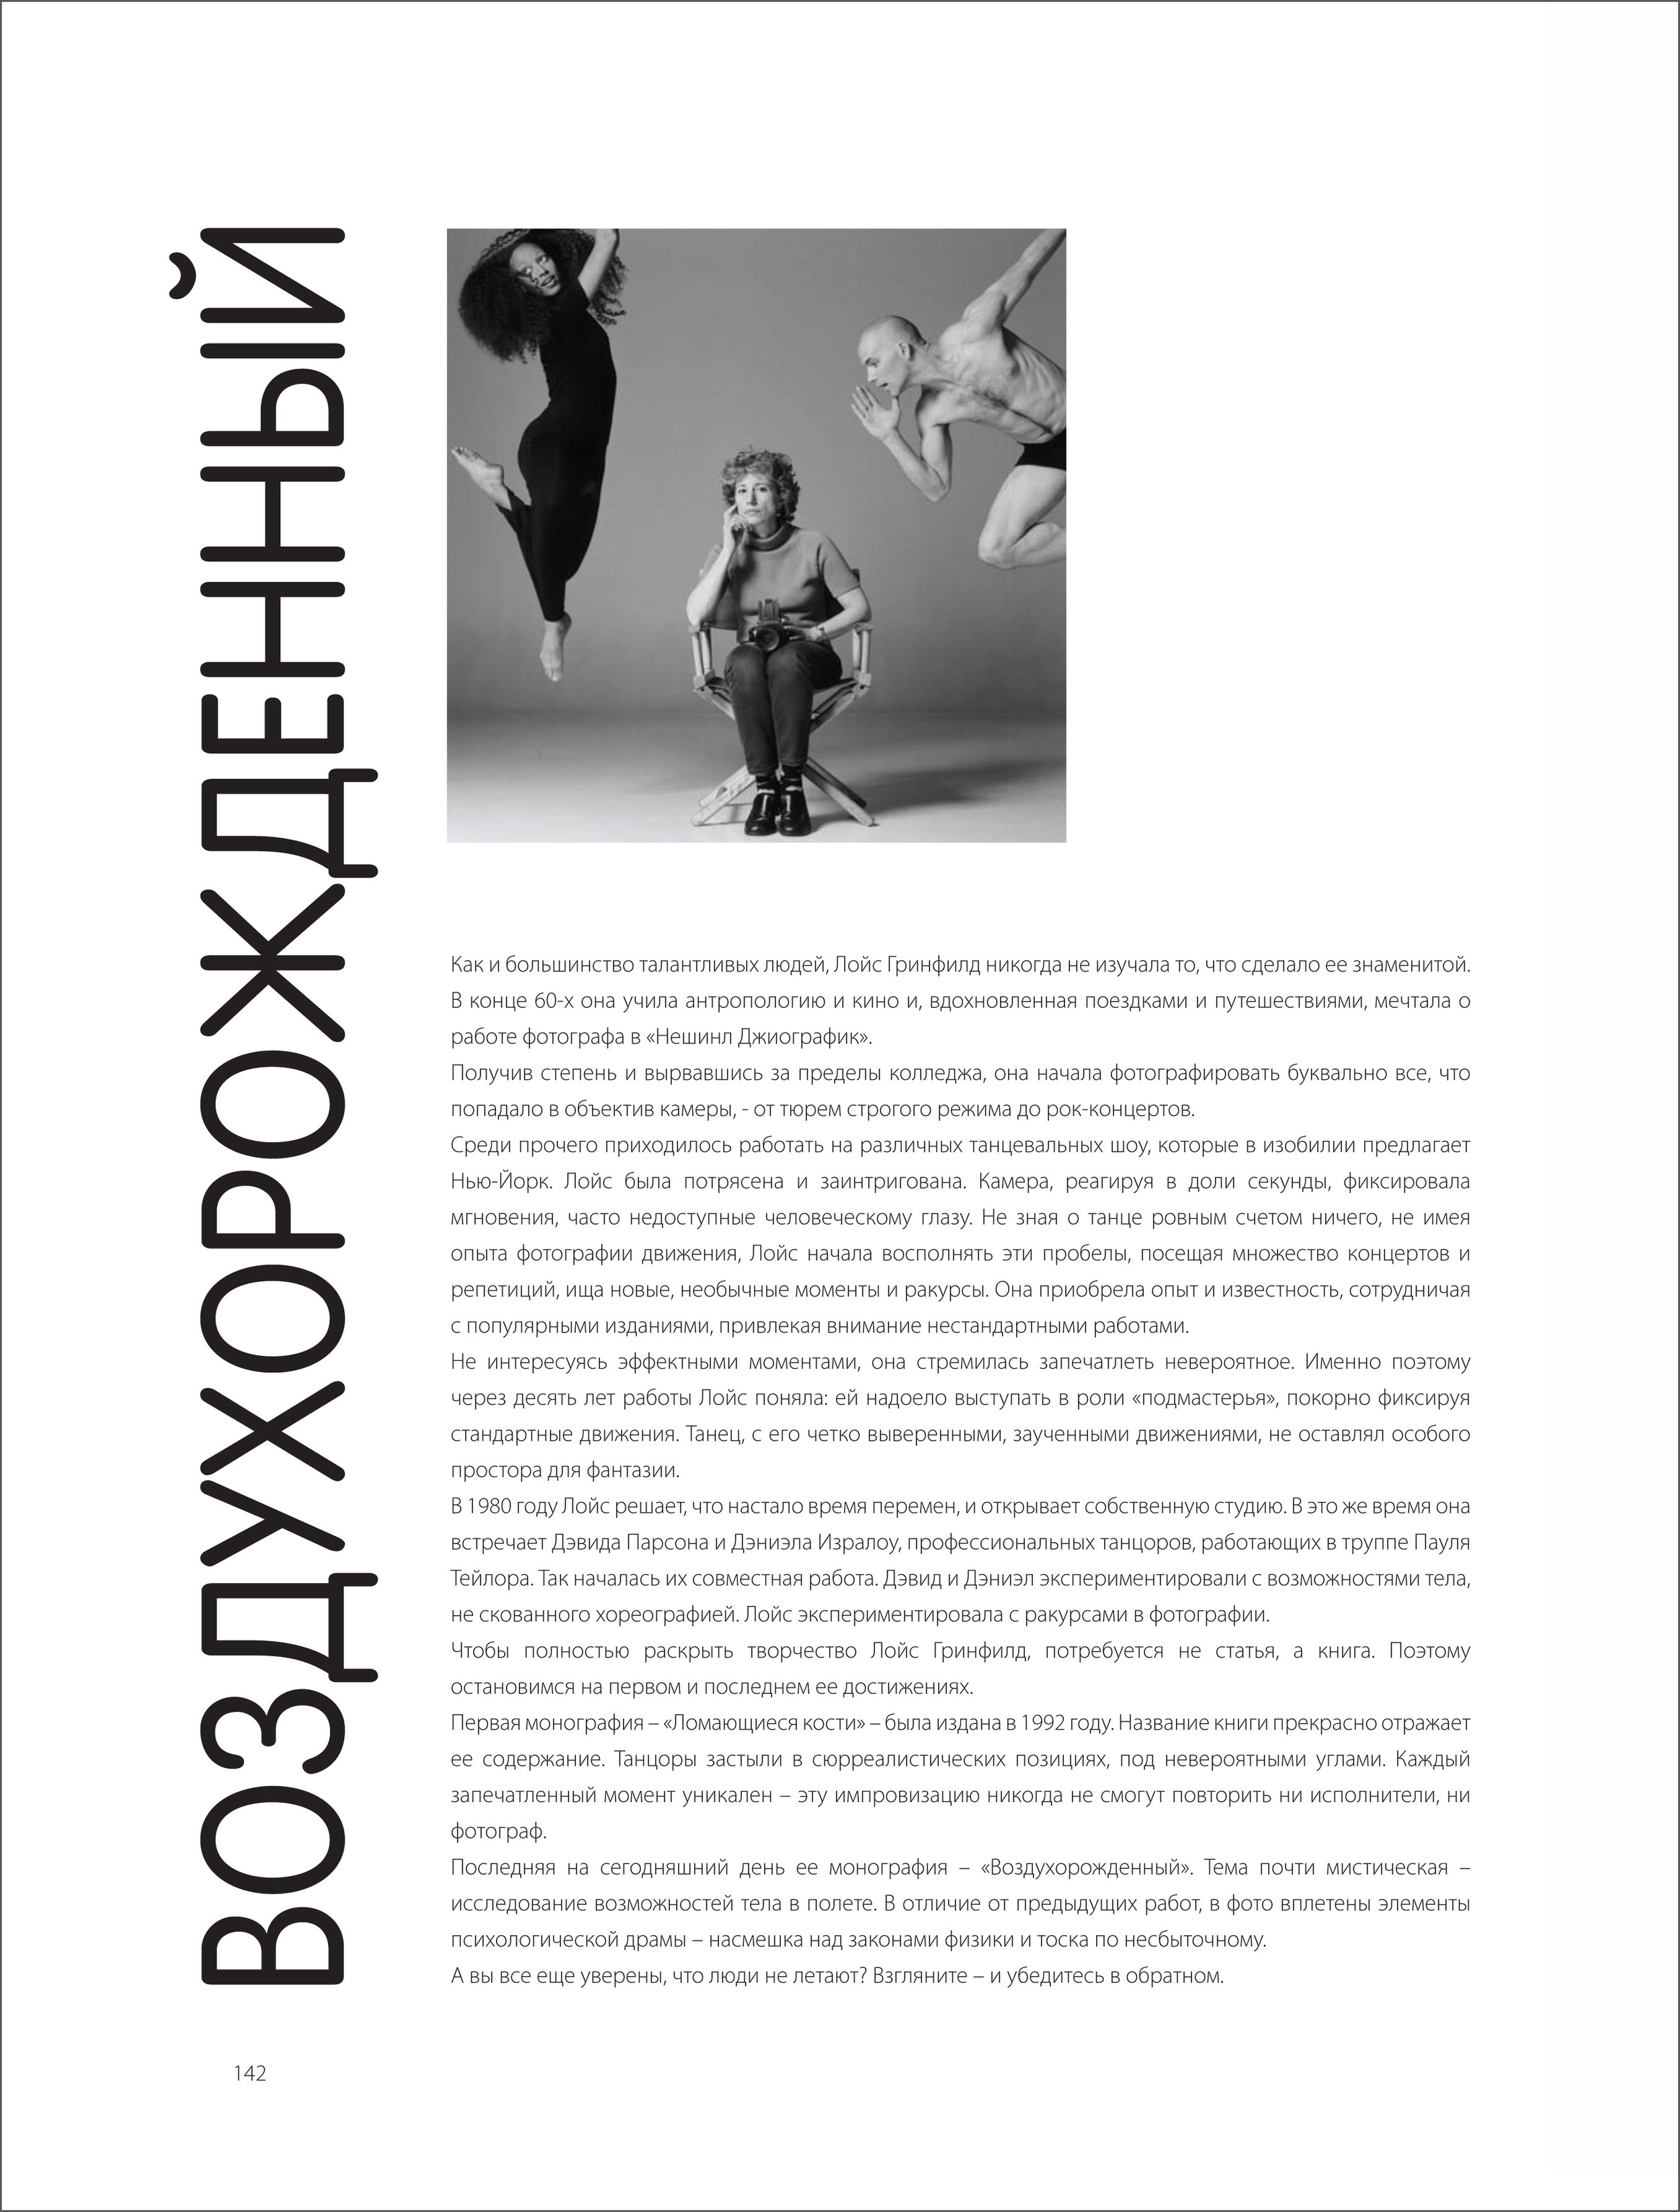 ZUZA 2007 Russian 1.jpg